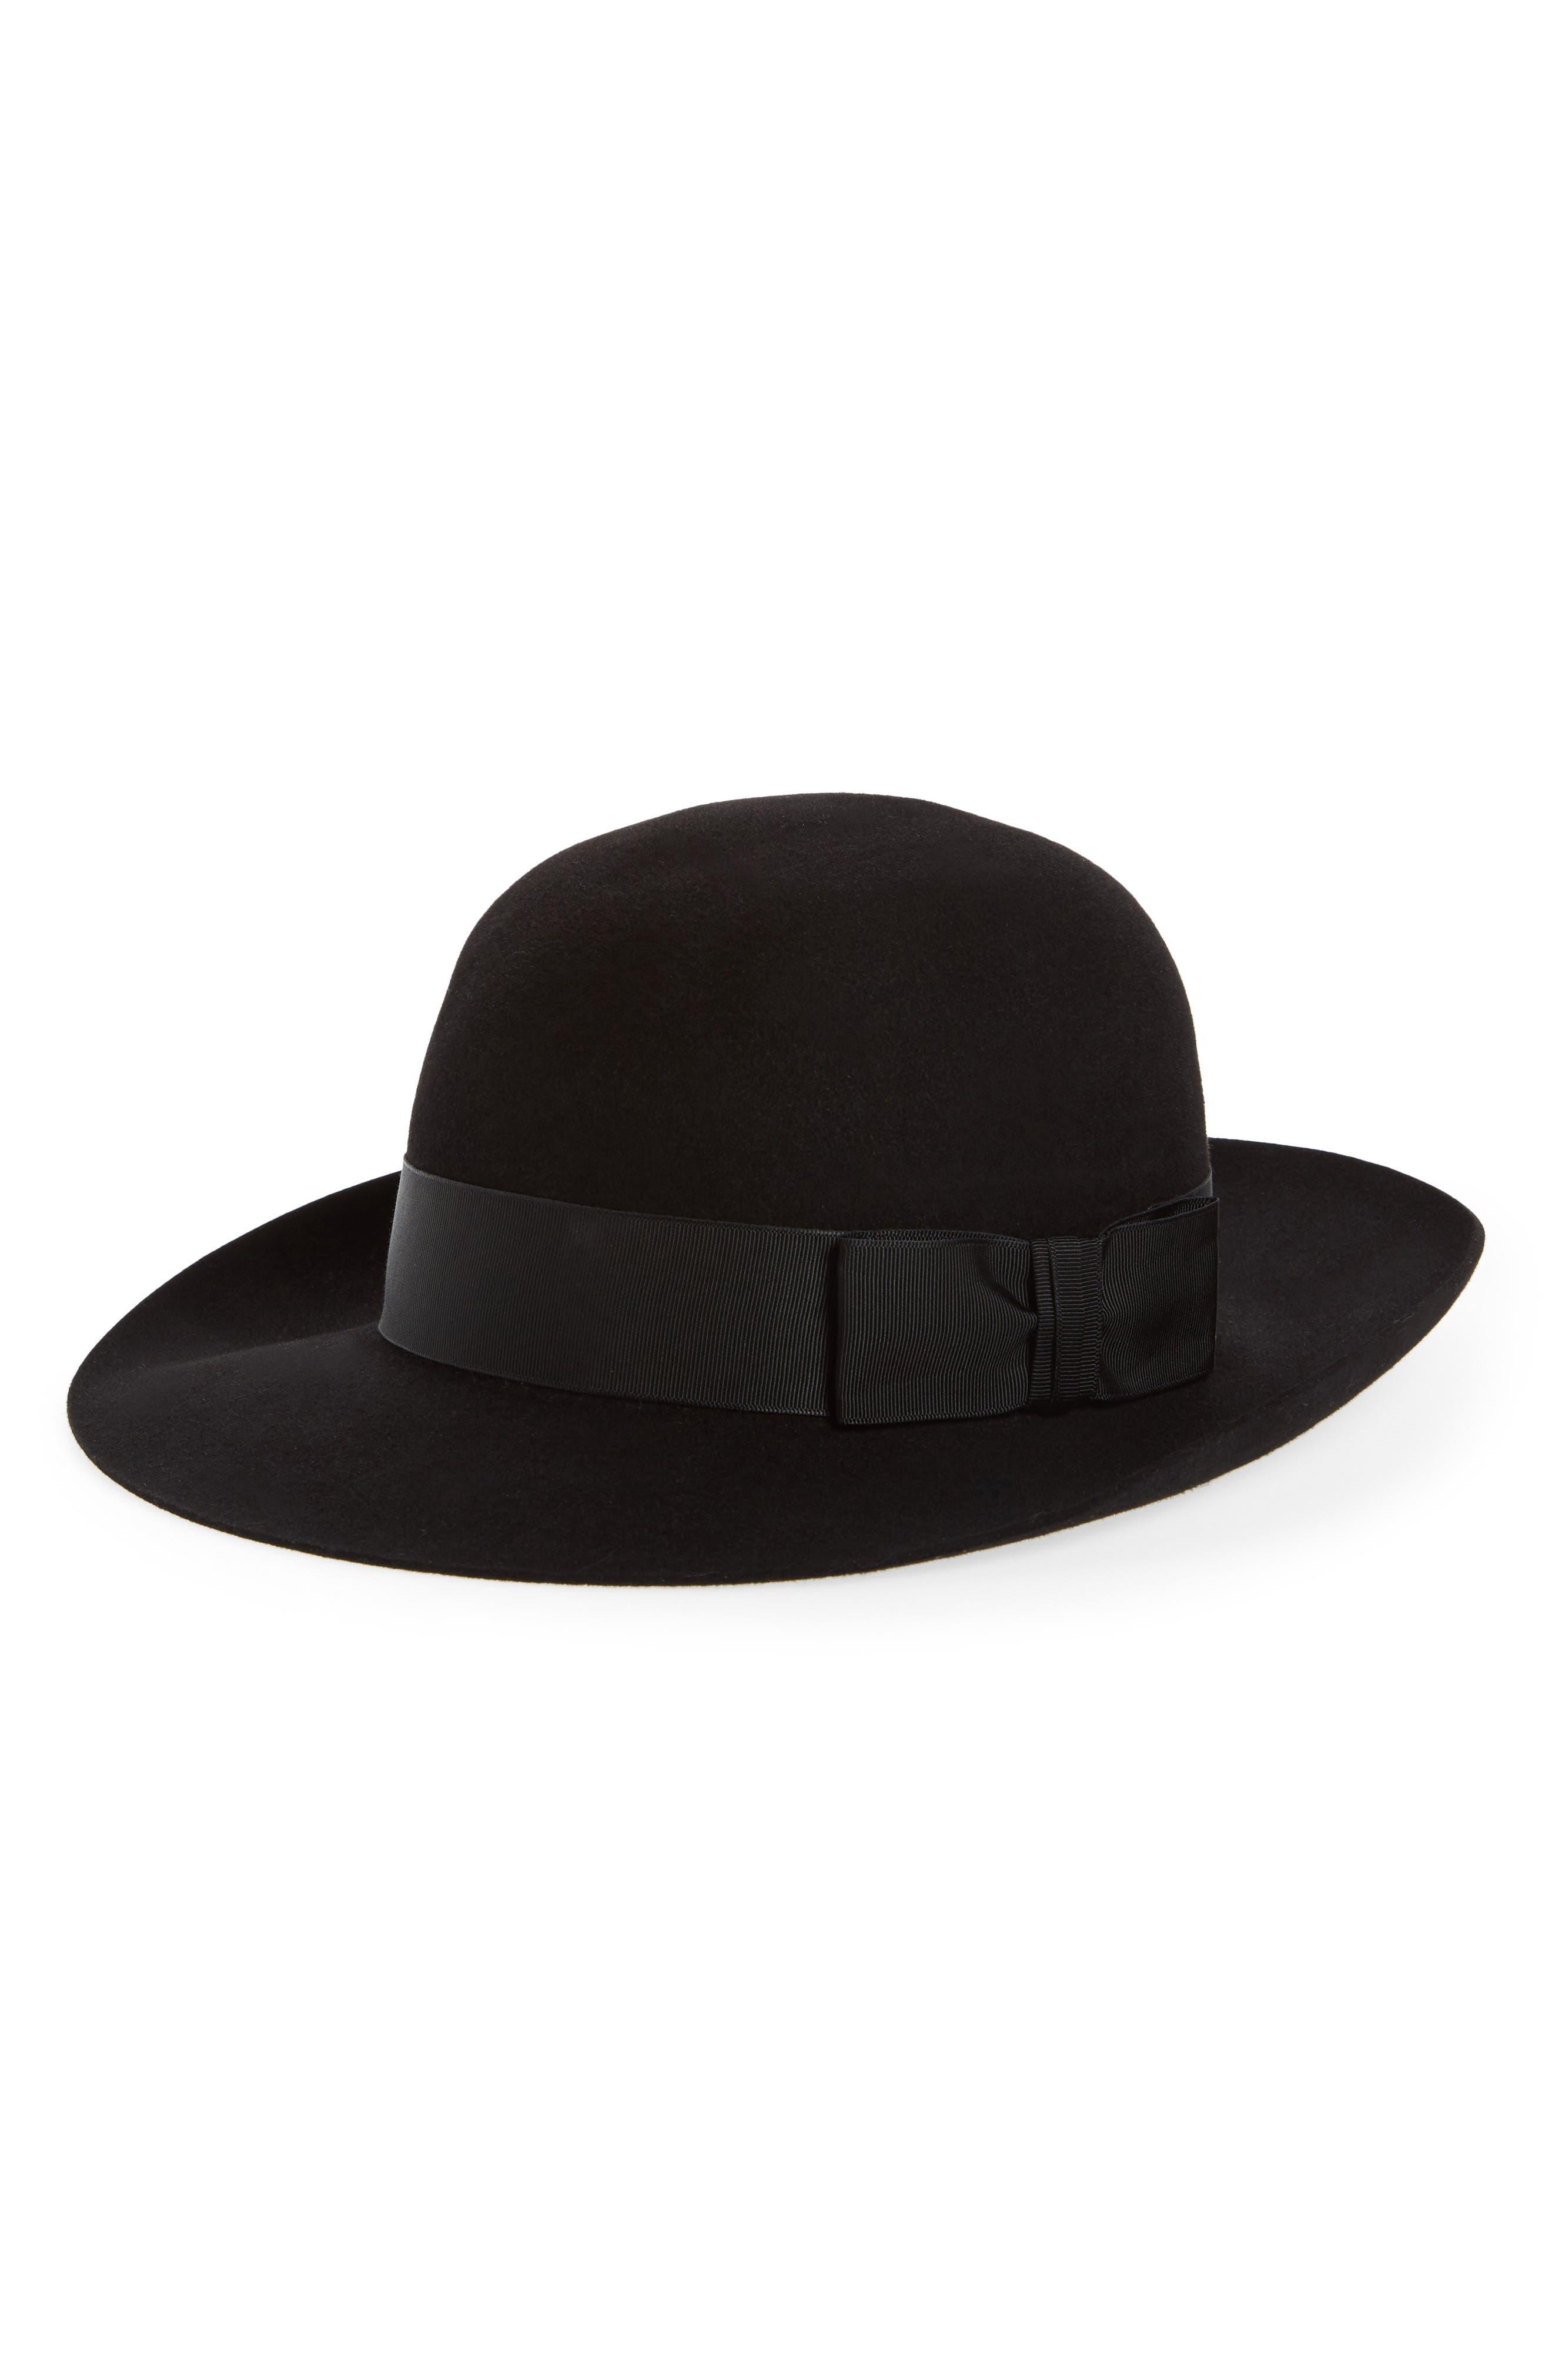 Christy's Wool Safari Hat